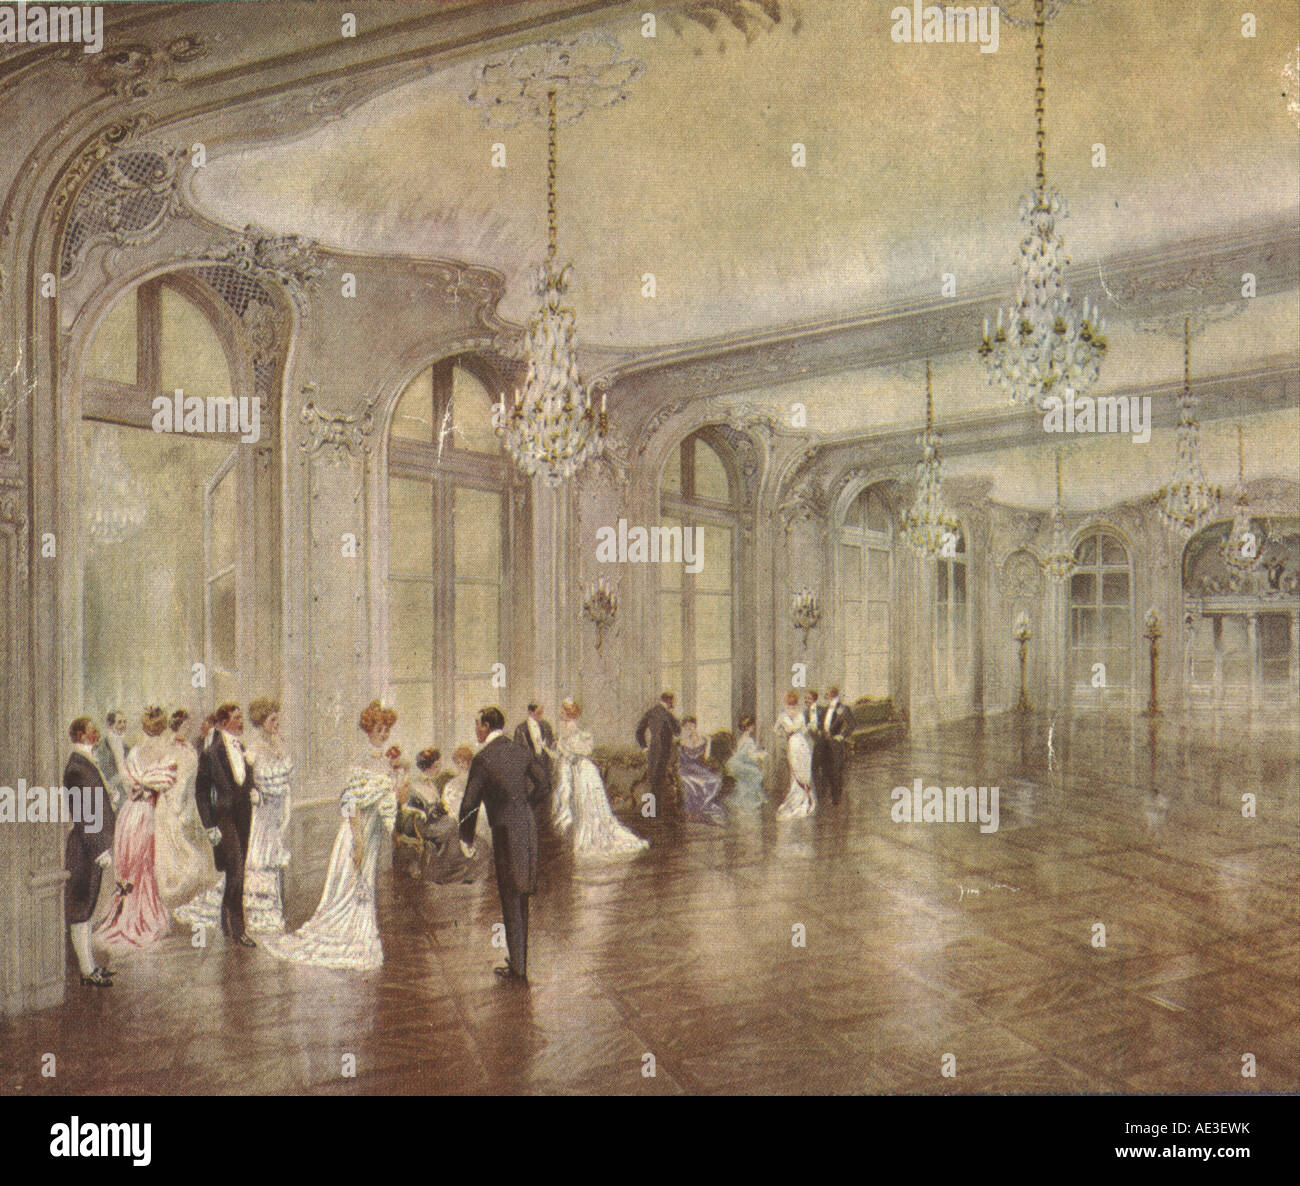 The Savoy Hotel Ballroom, London 1911 - Stock Image